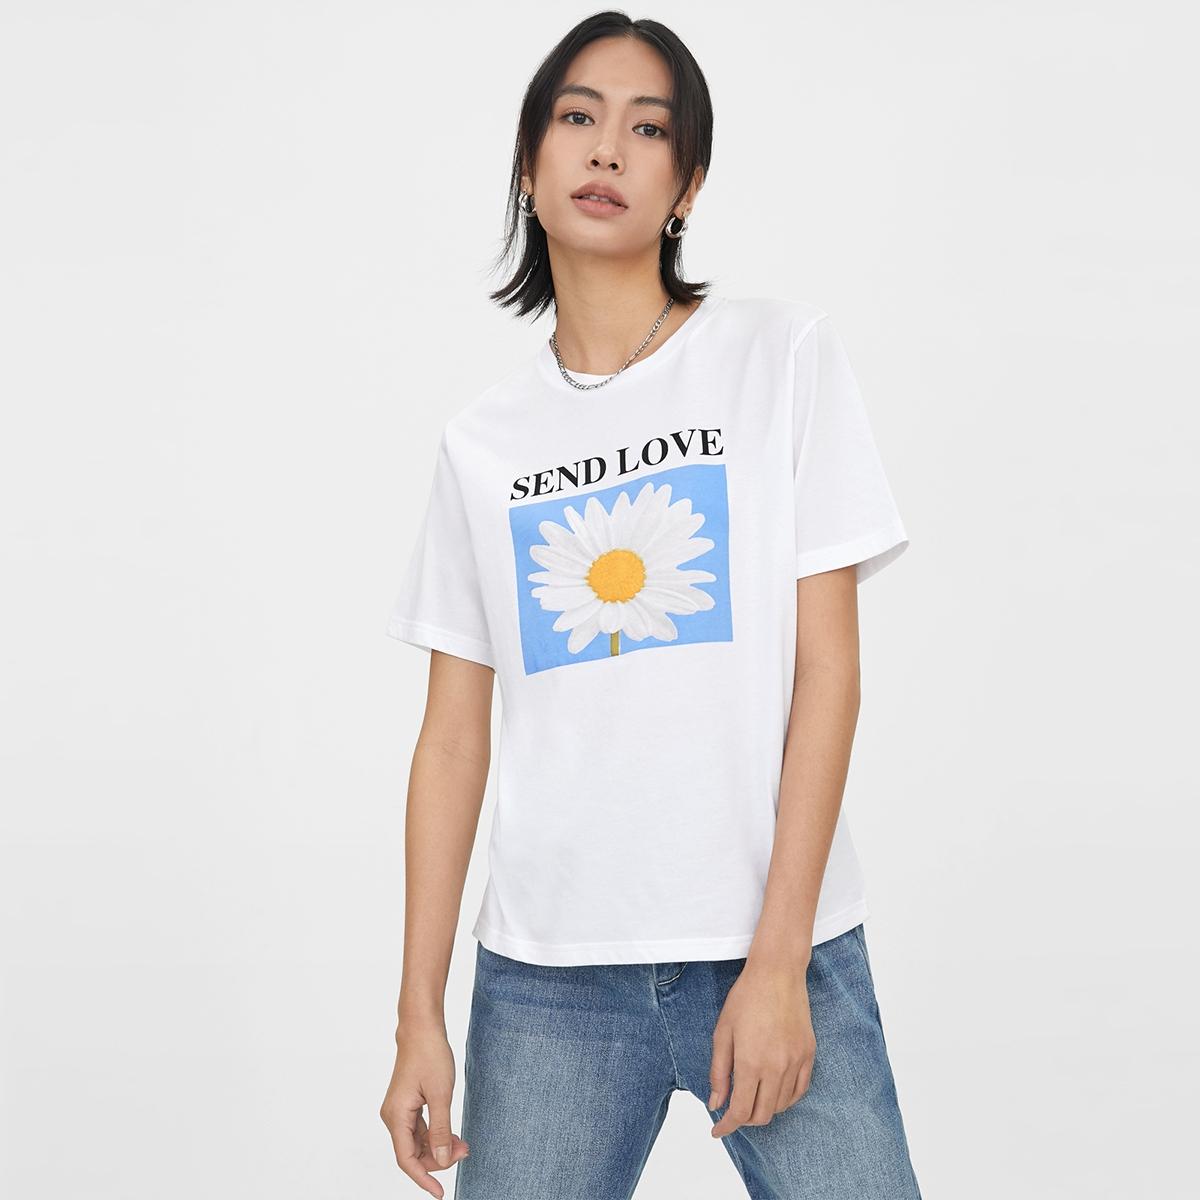 Send Love Organic Cotton Graphic Tee White